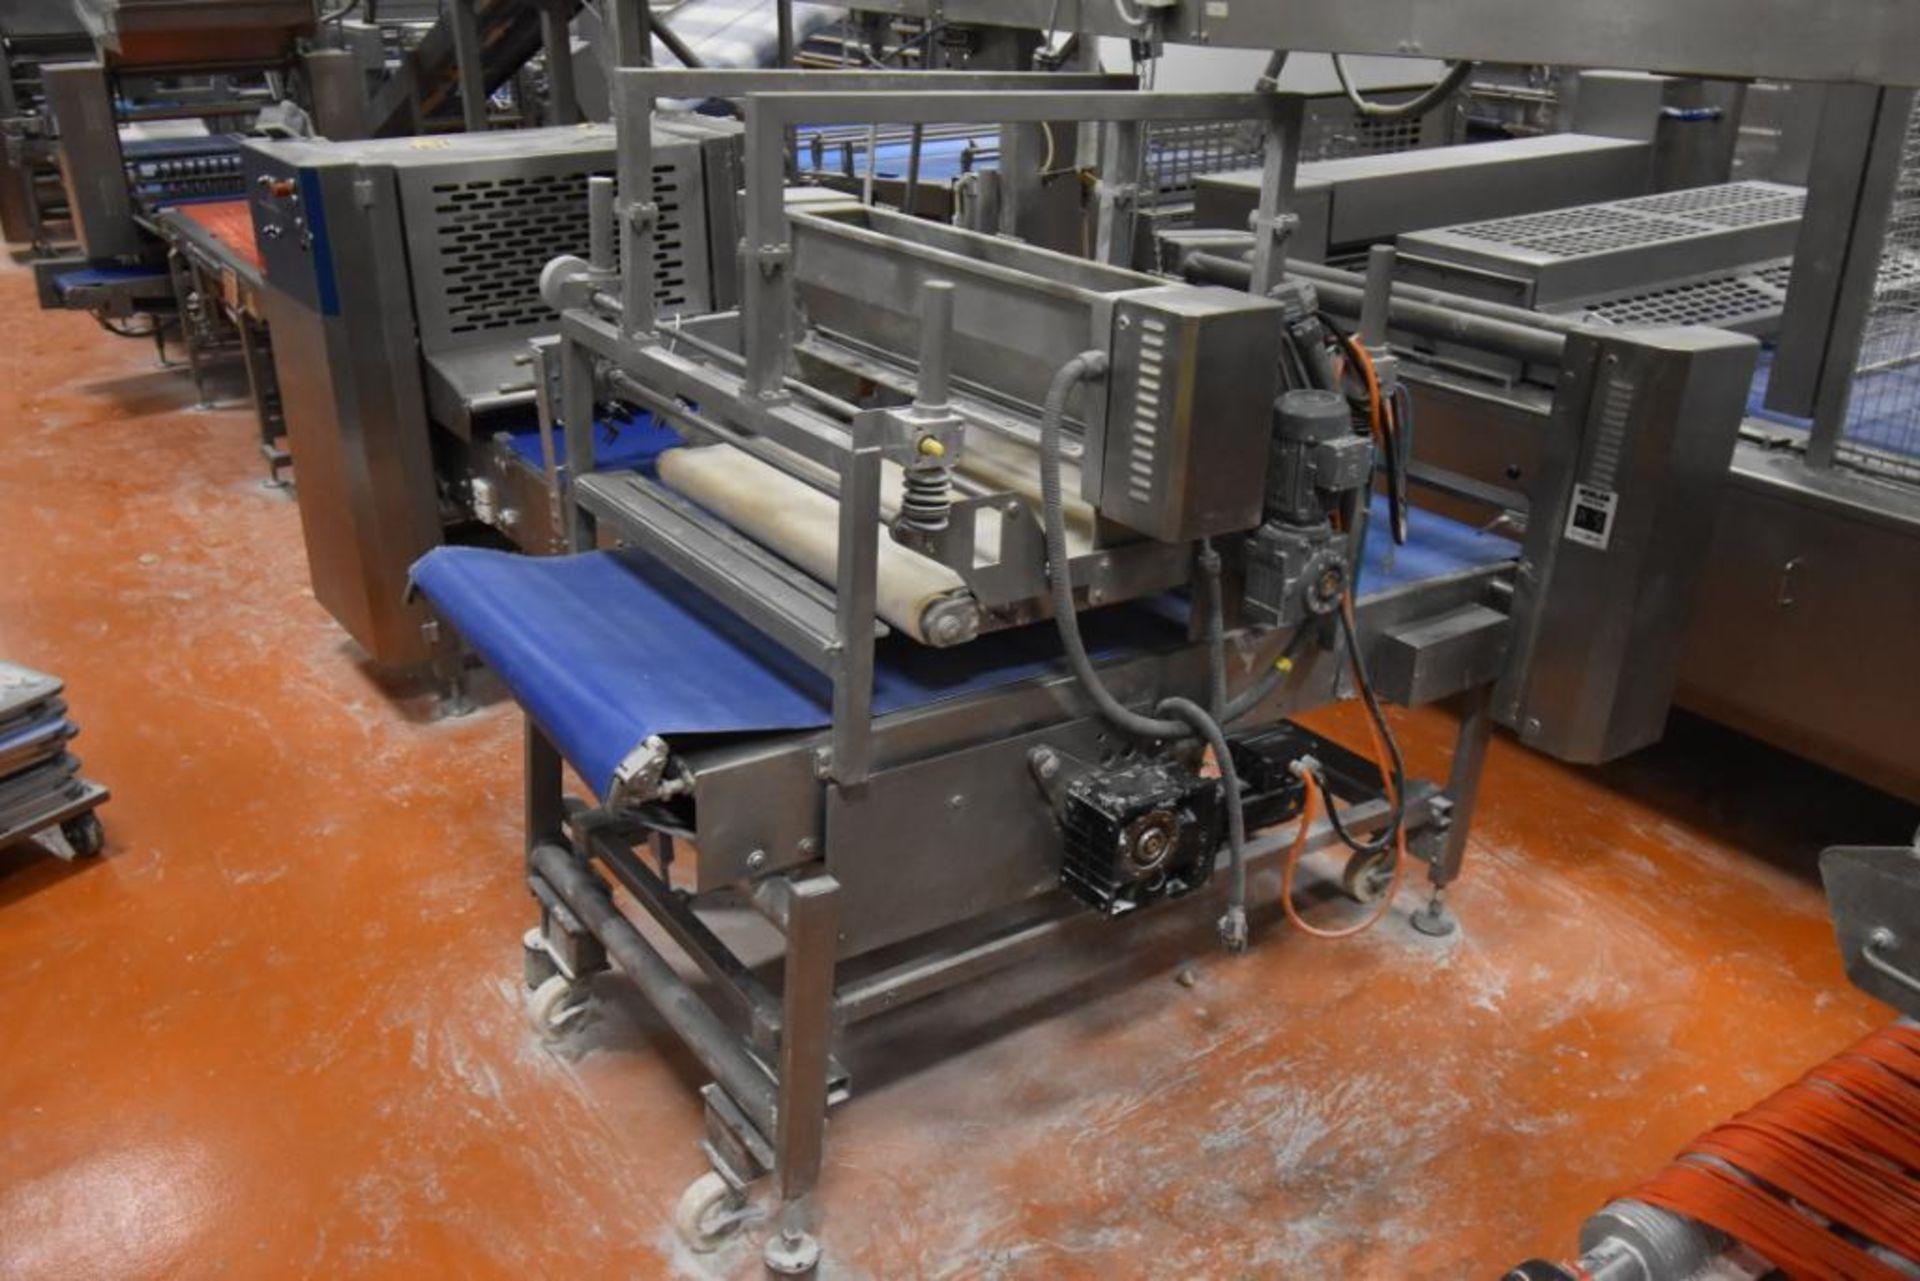 2007 Fritsch Laminator 3000 dough line - Image 278 of 280